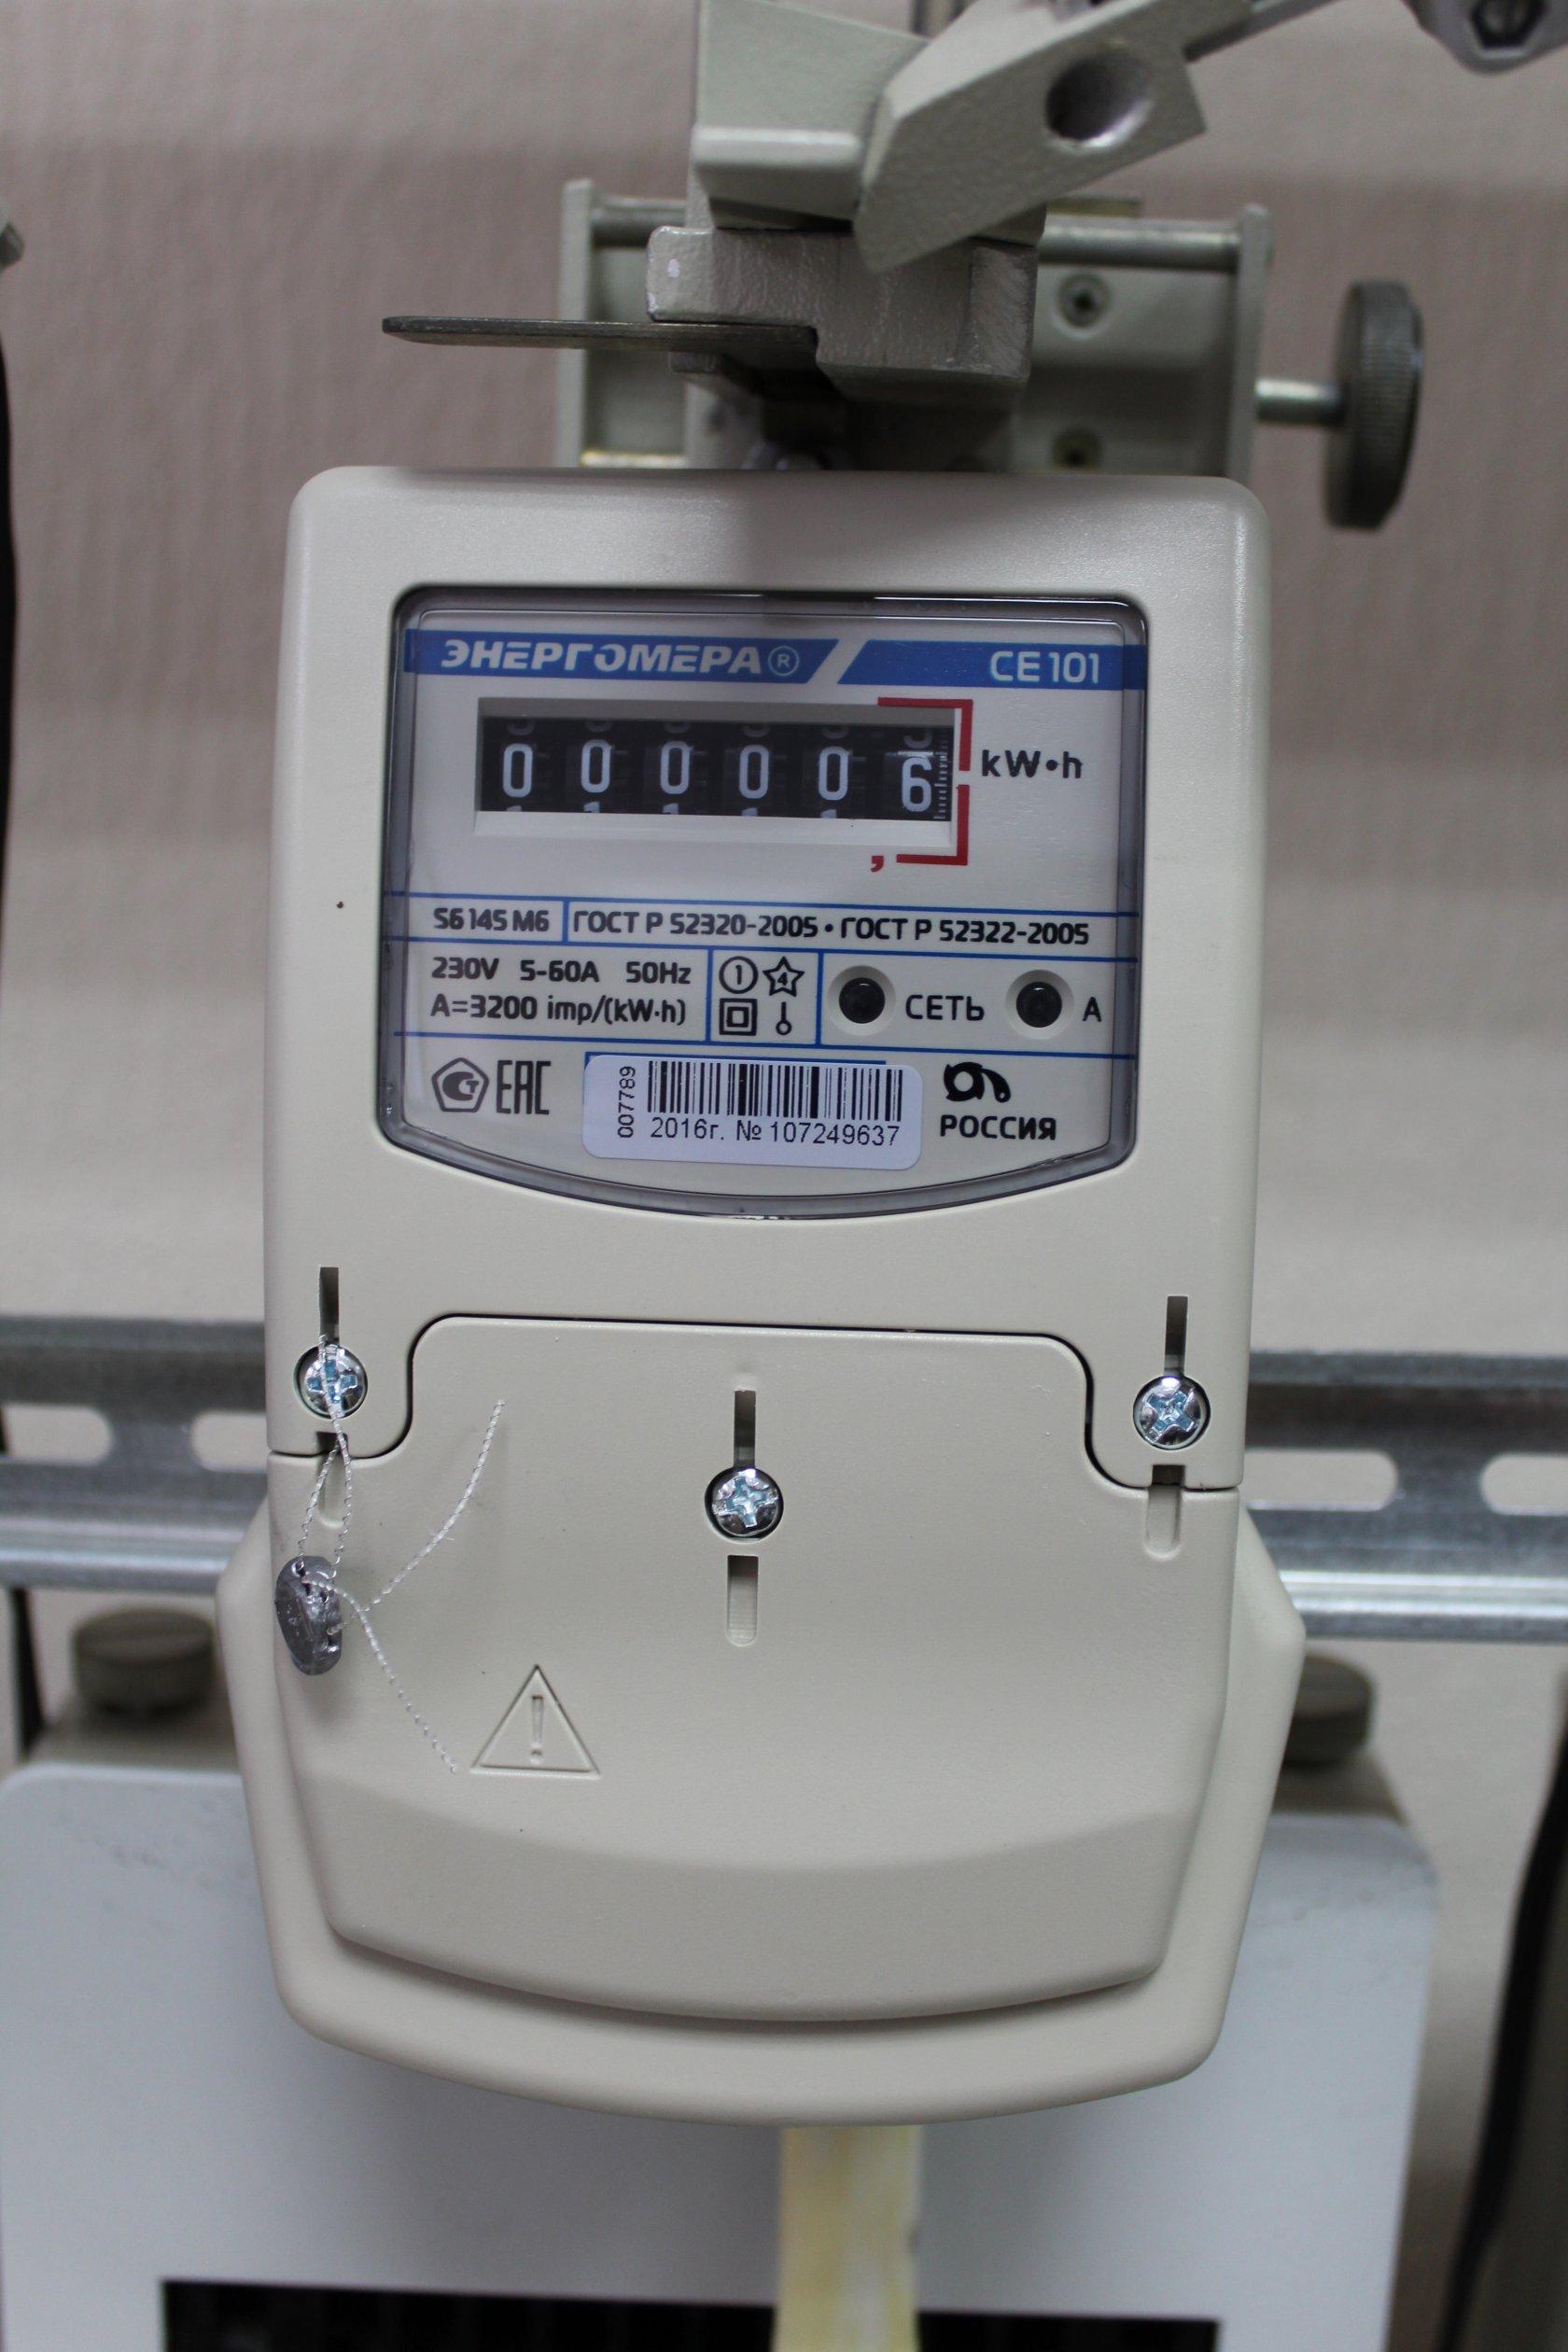 бланк заявки на опламбировку водосчетчика